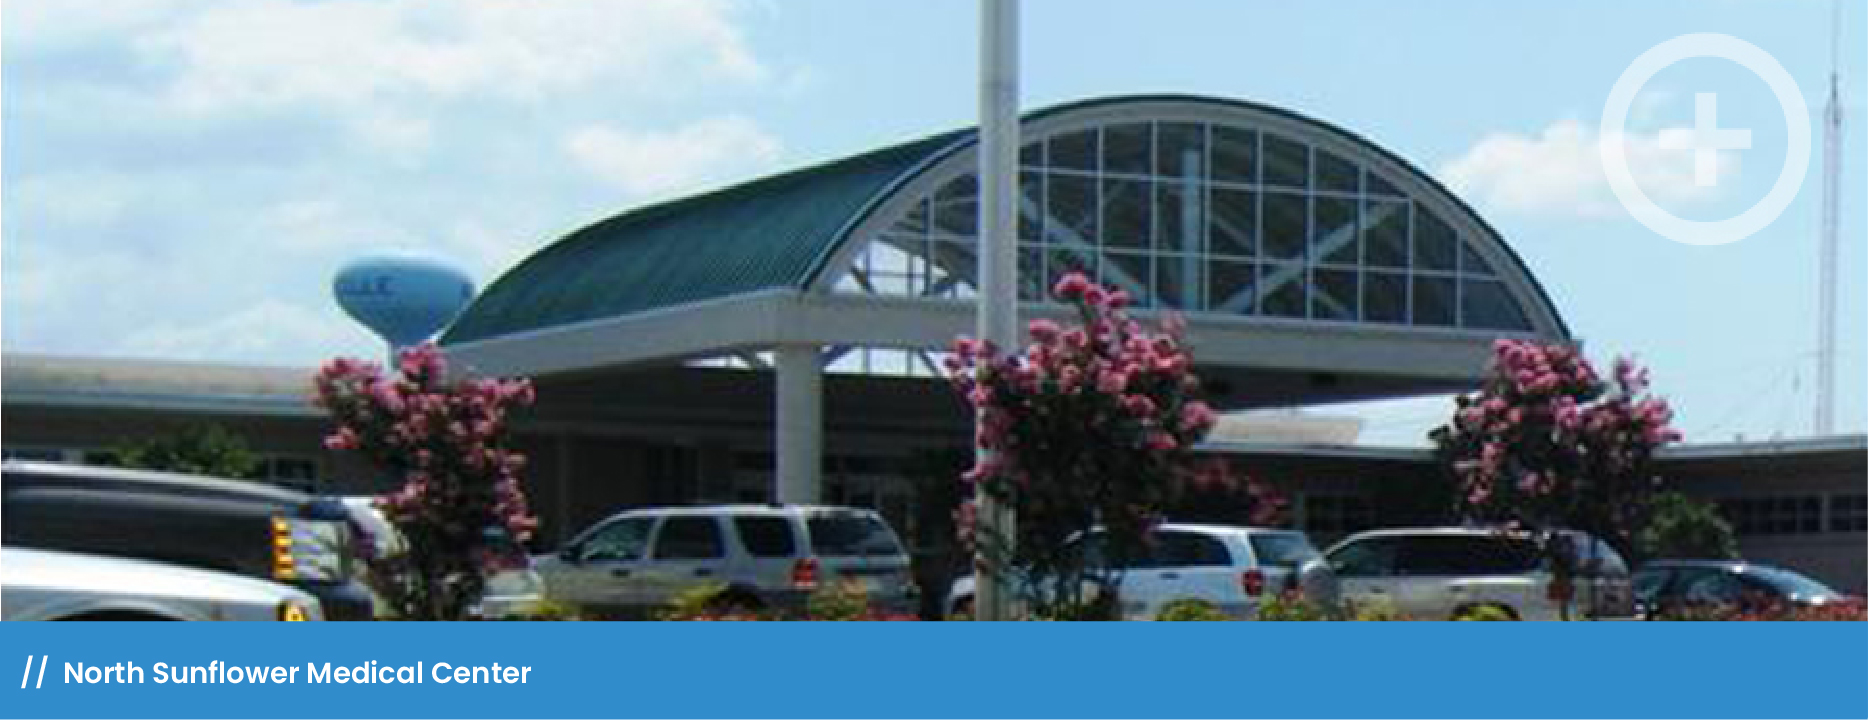 Yanik-Watermark_North Sunflower Medical Center